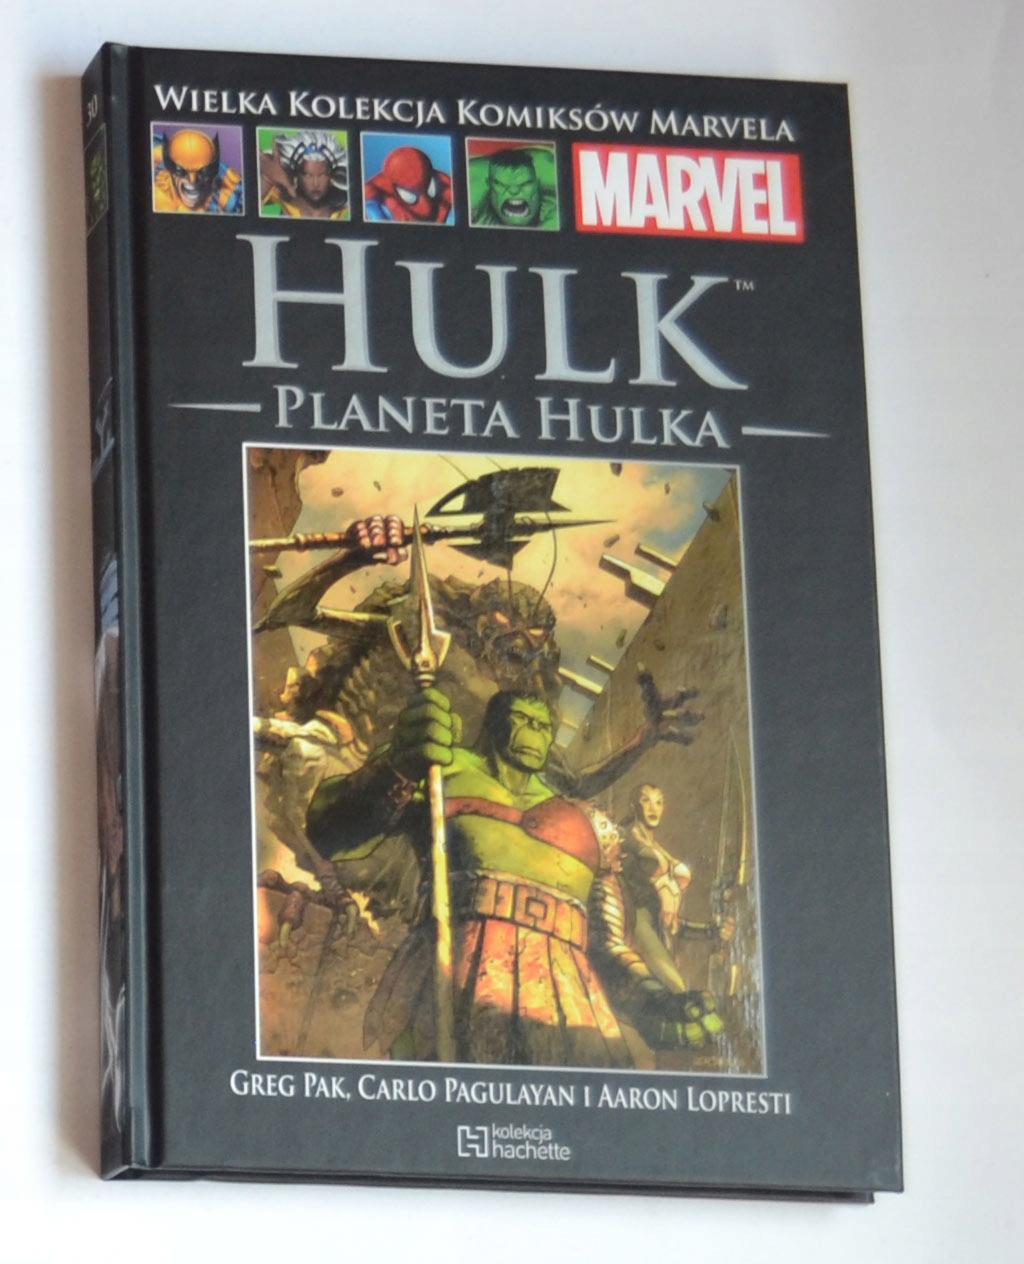 WKKM 30 Hulk Planeta Hulka